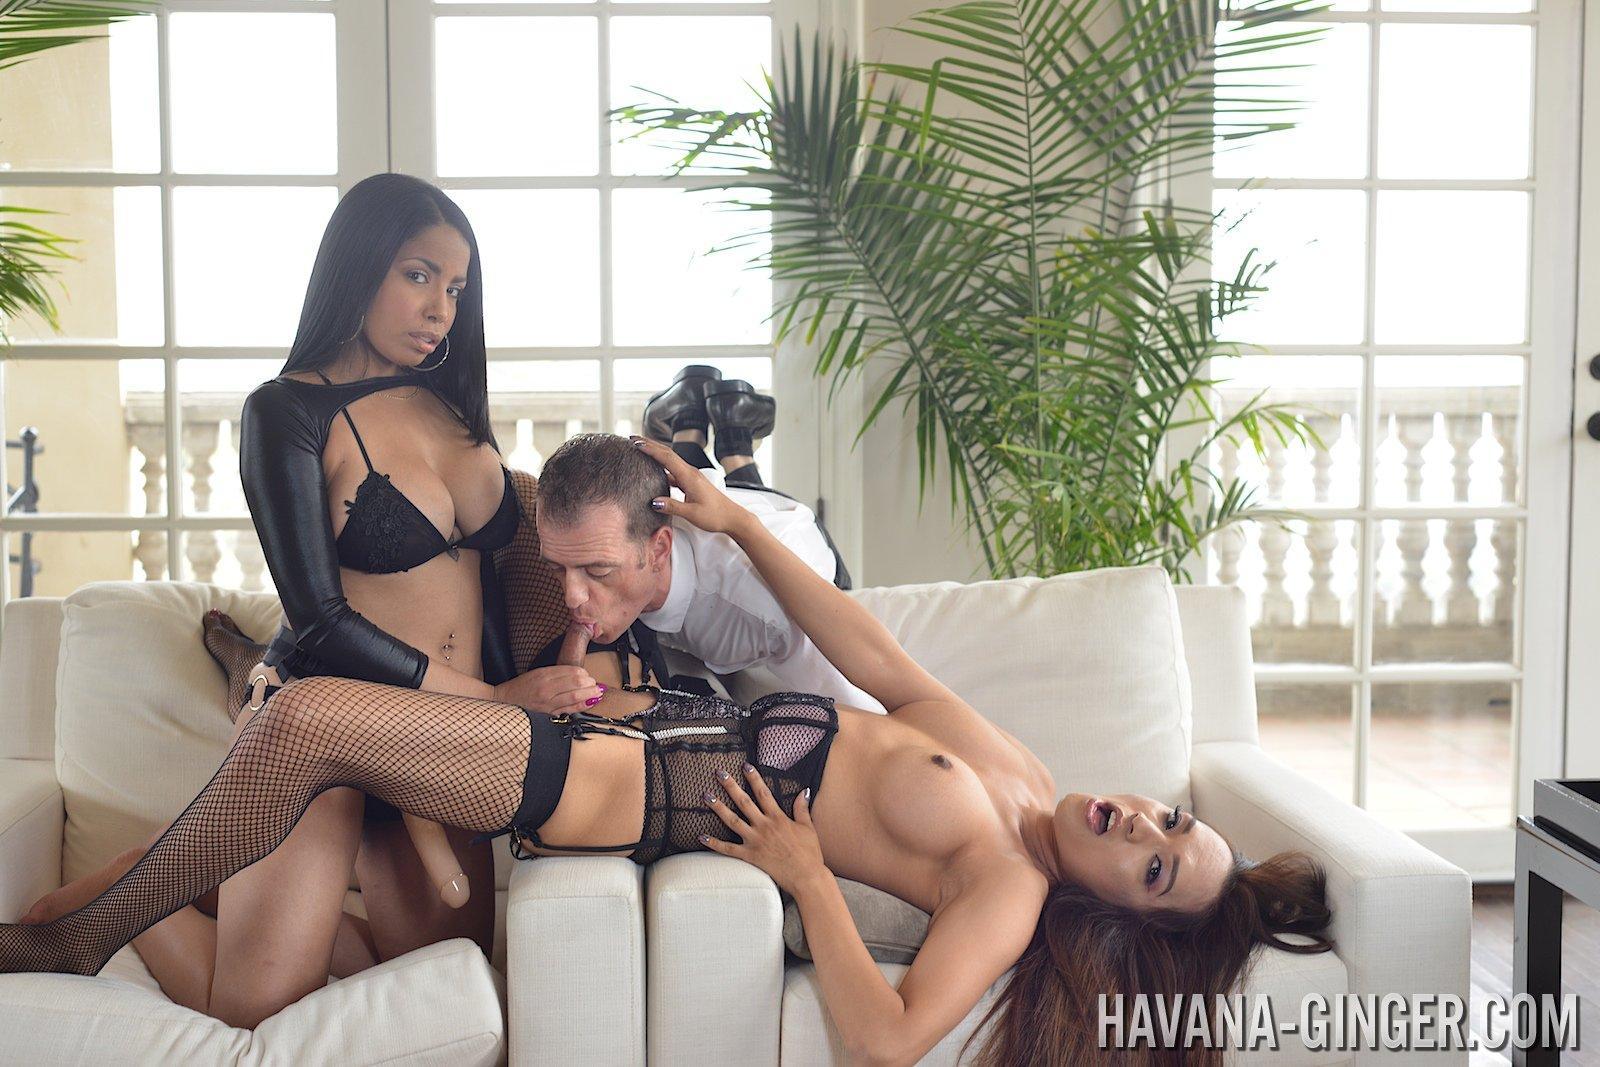 Havana Ginger in Transsexual Team Work